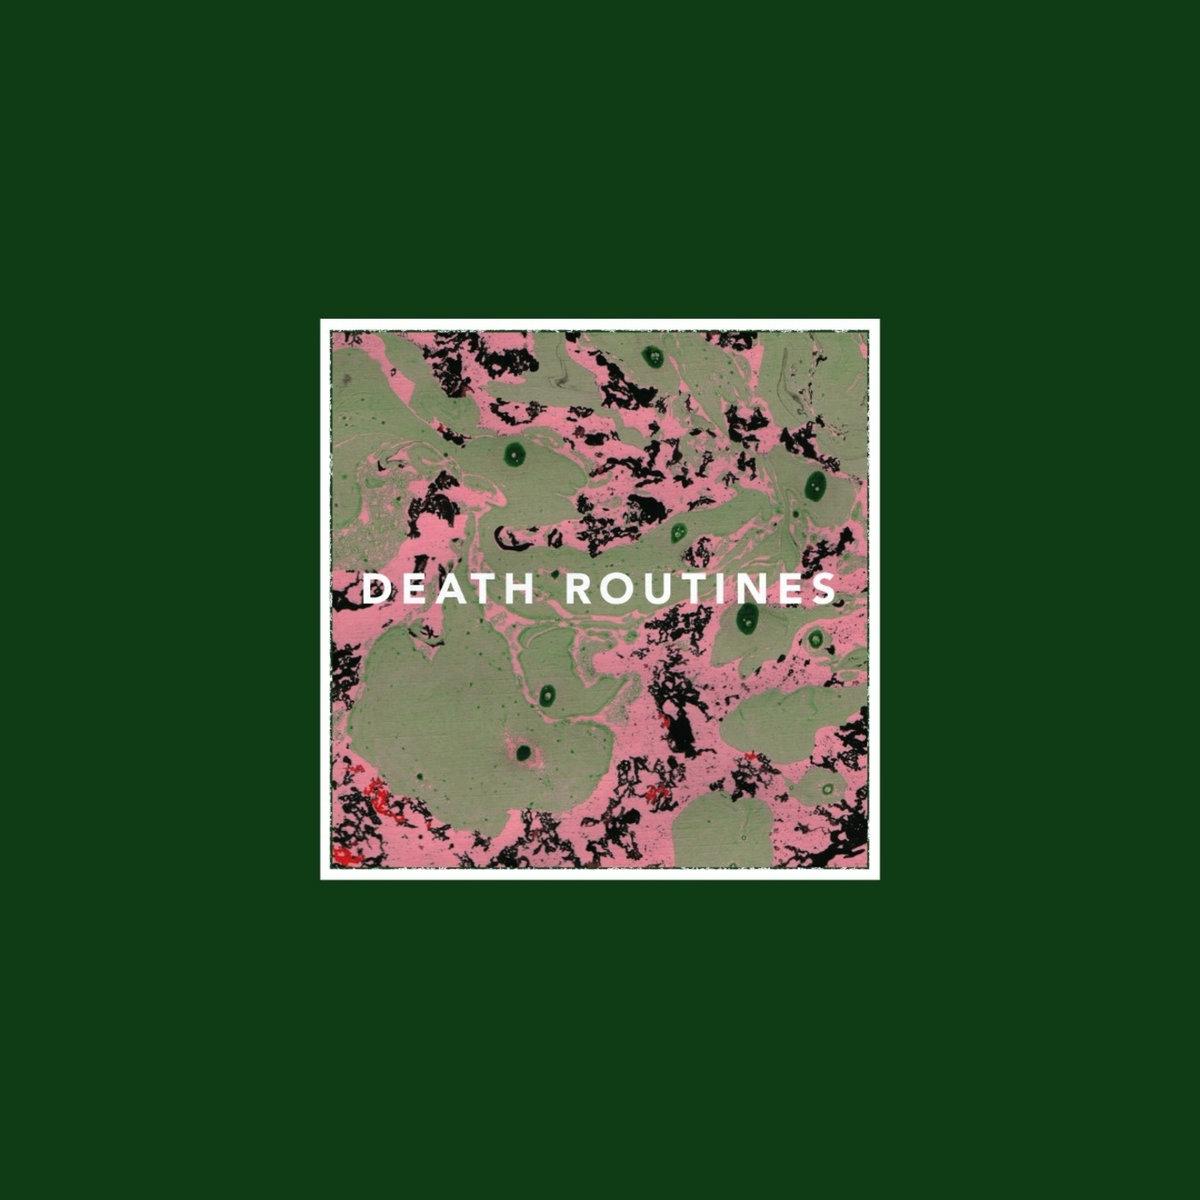 Stream Demersal's Majestically Brutal Screamo EP Death Routines